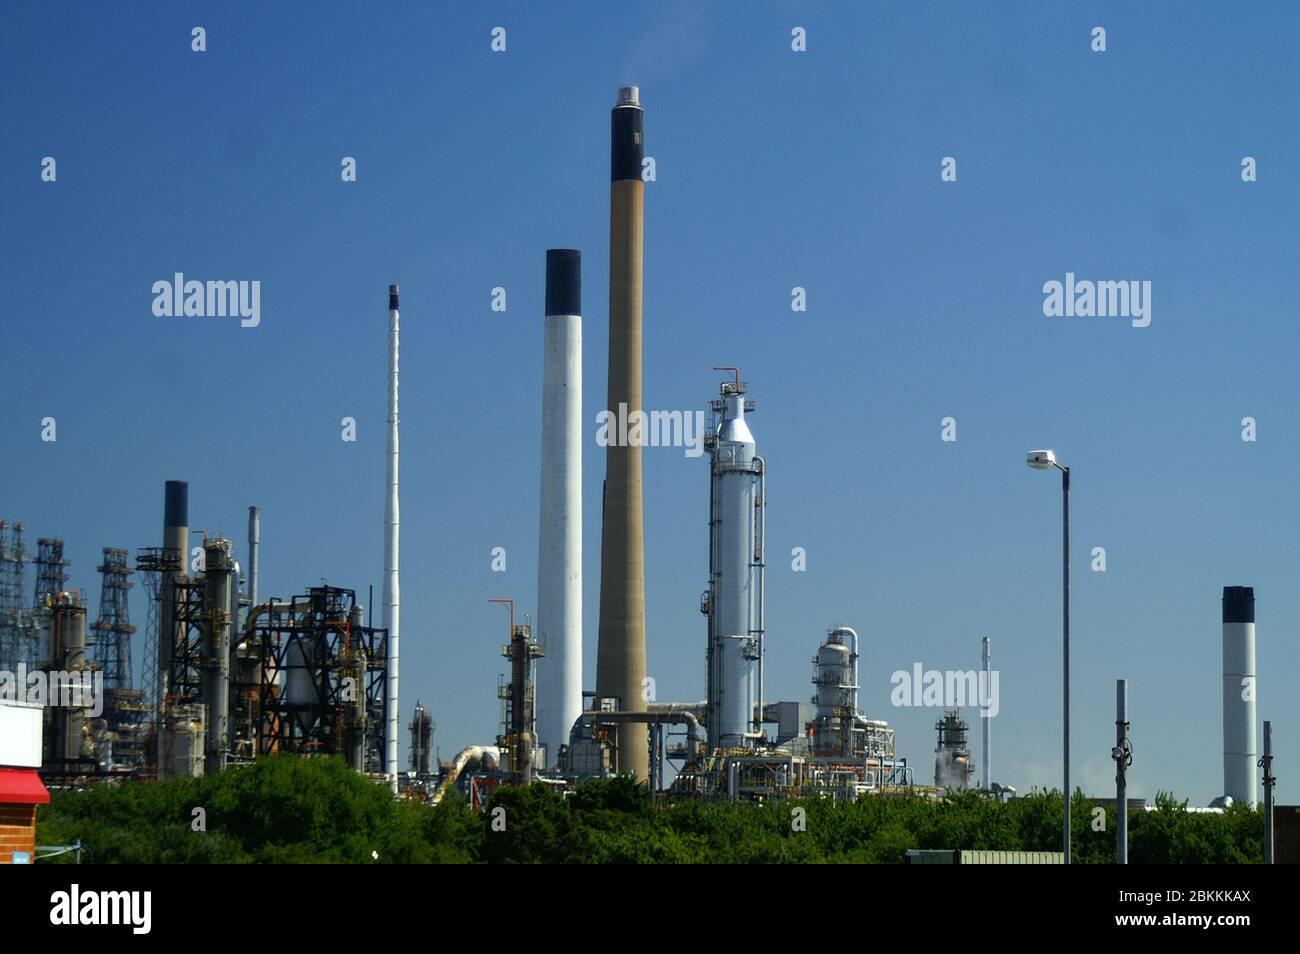 industrial refinery, Australia Stock Photo